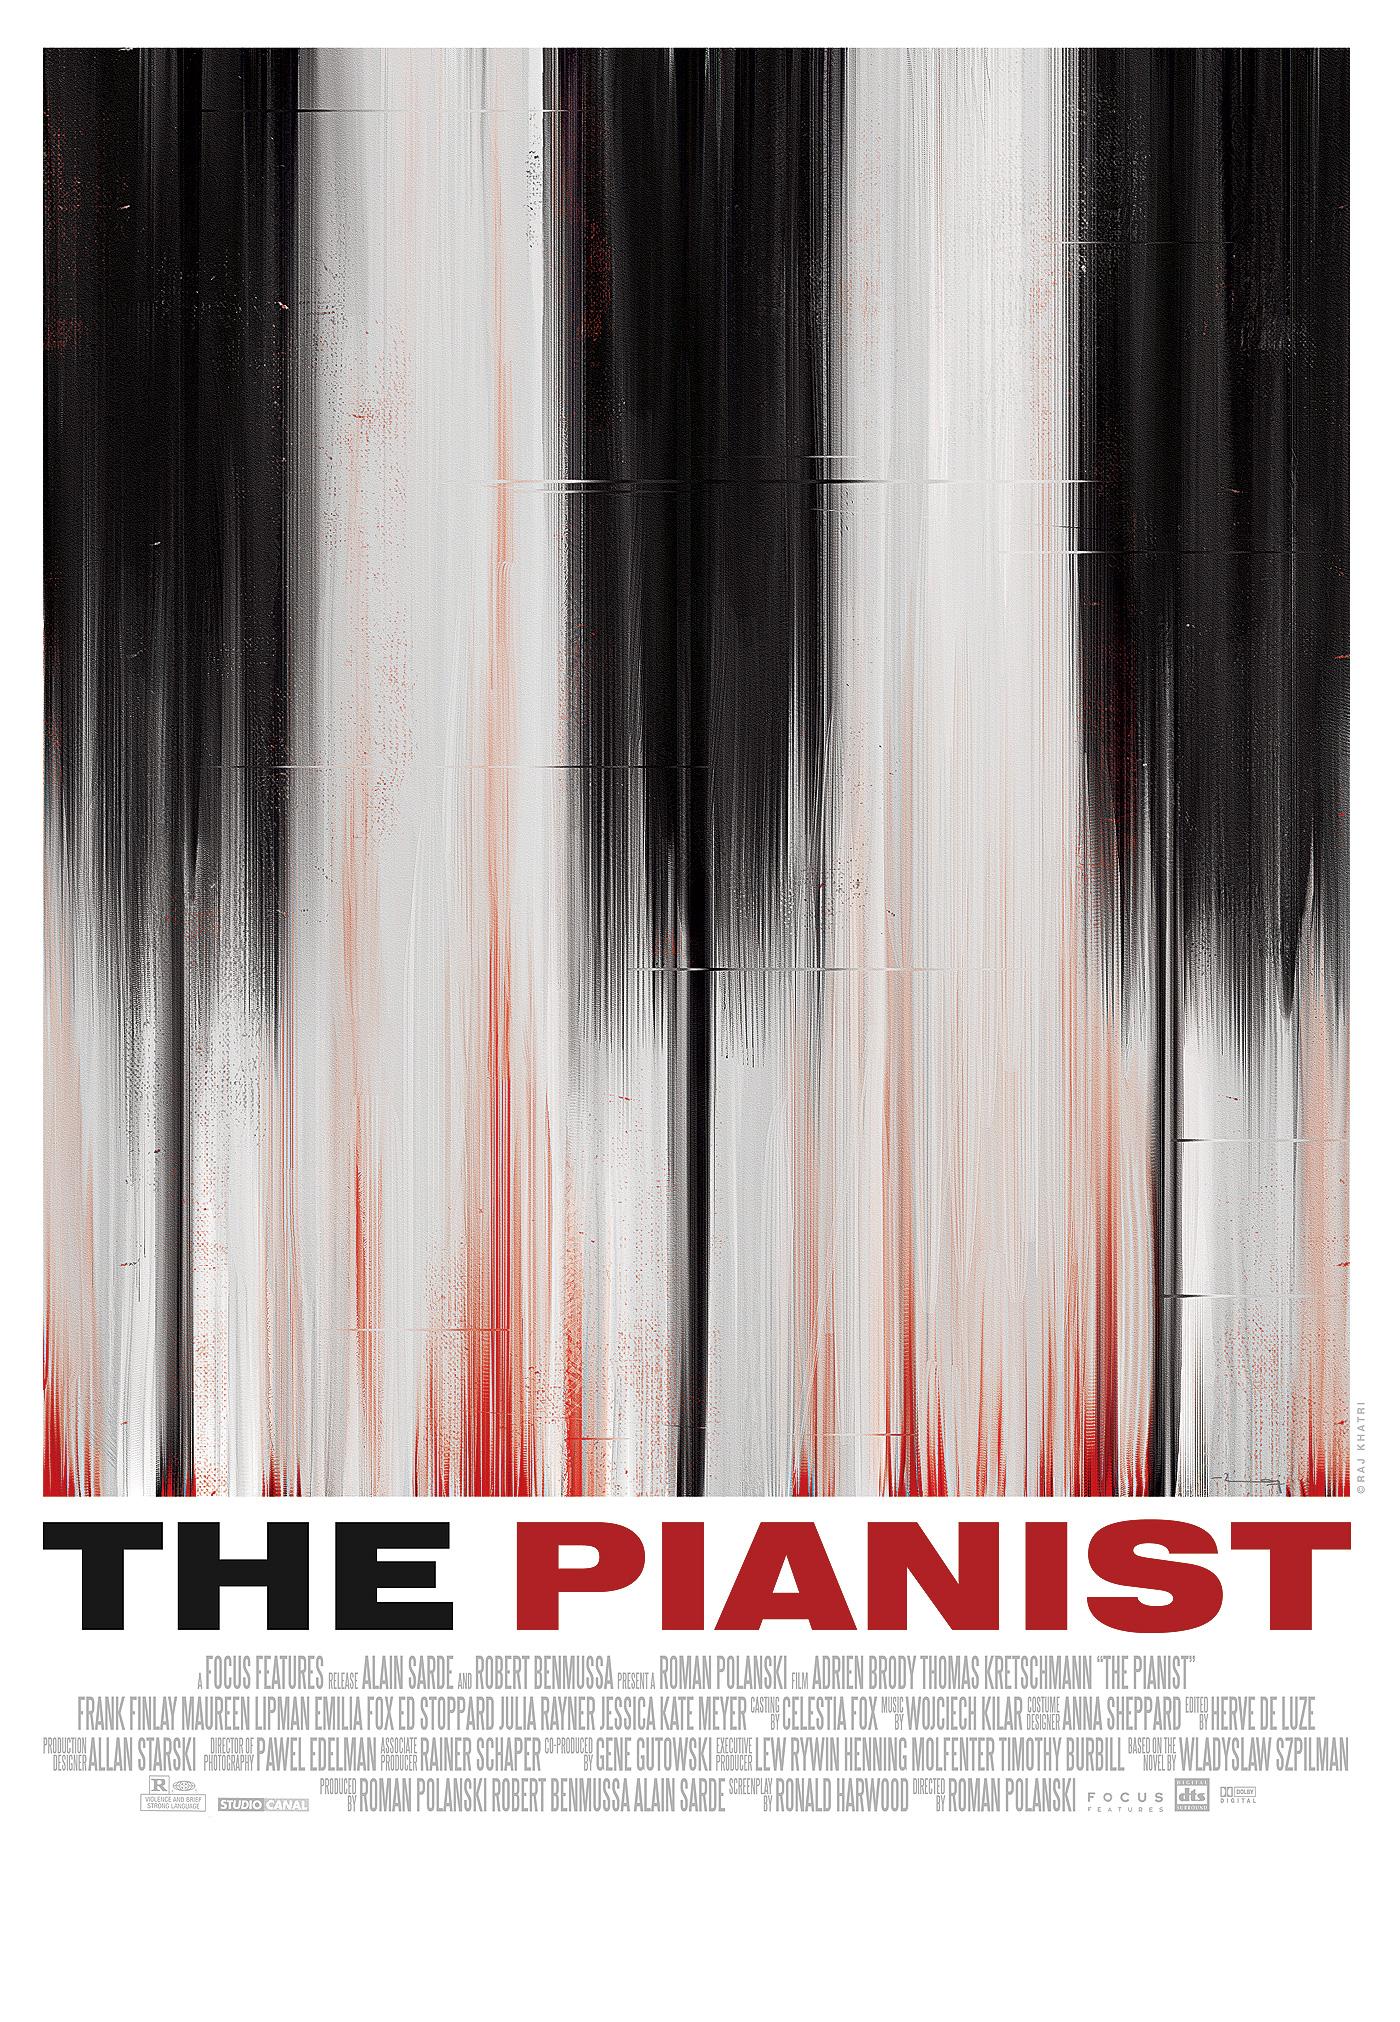 5pianist (1)